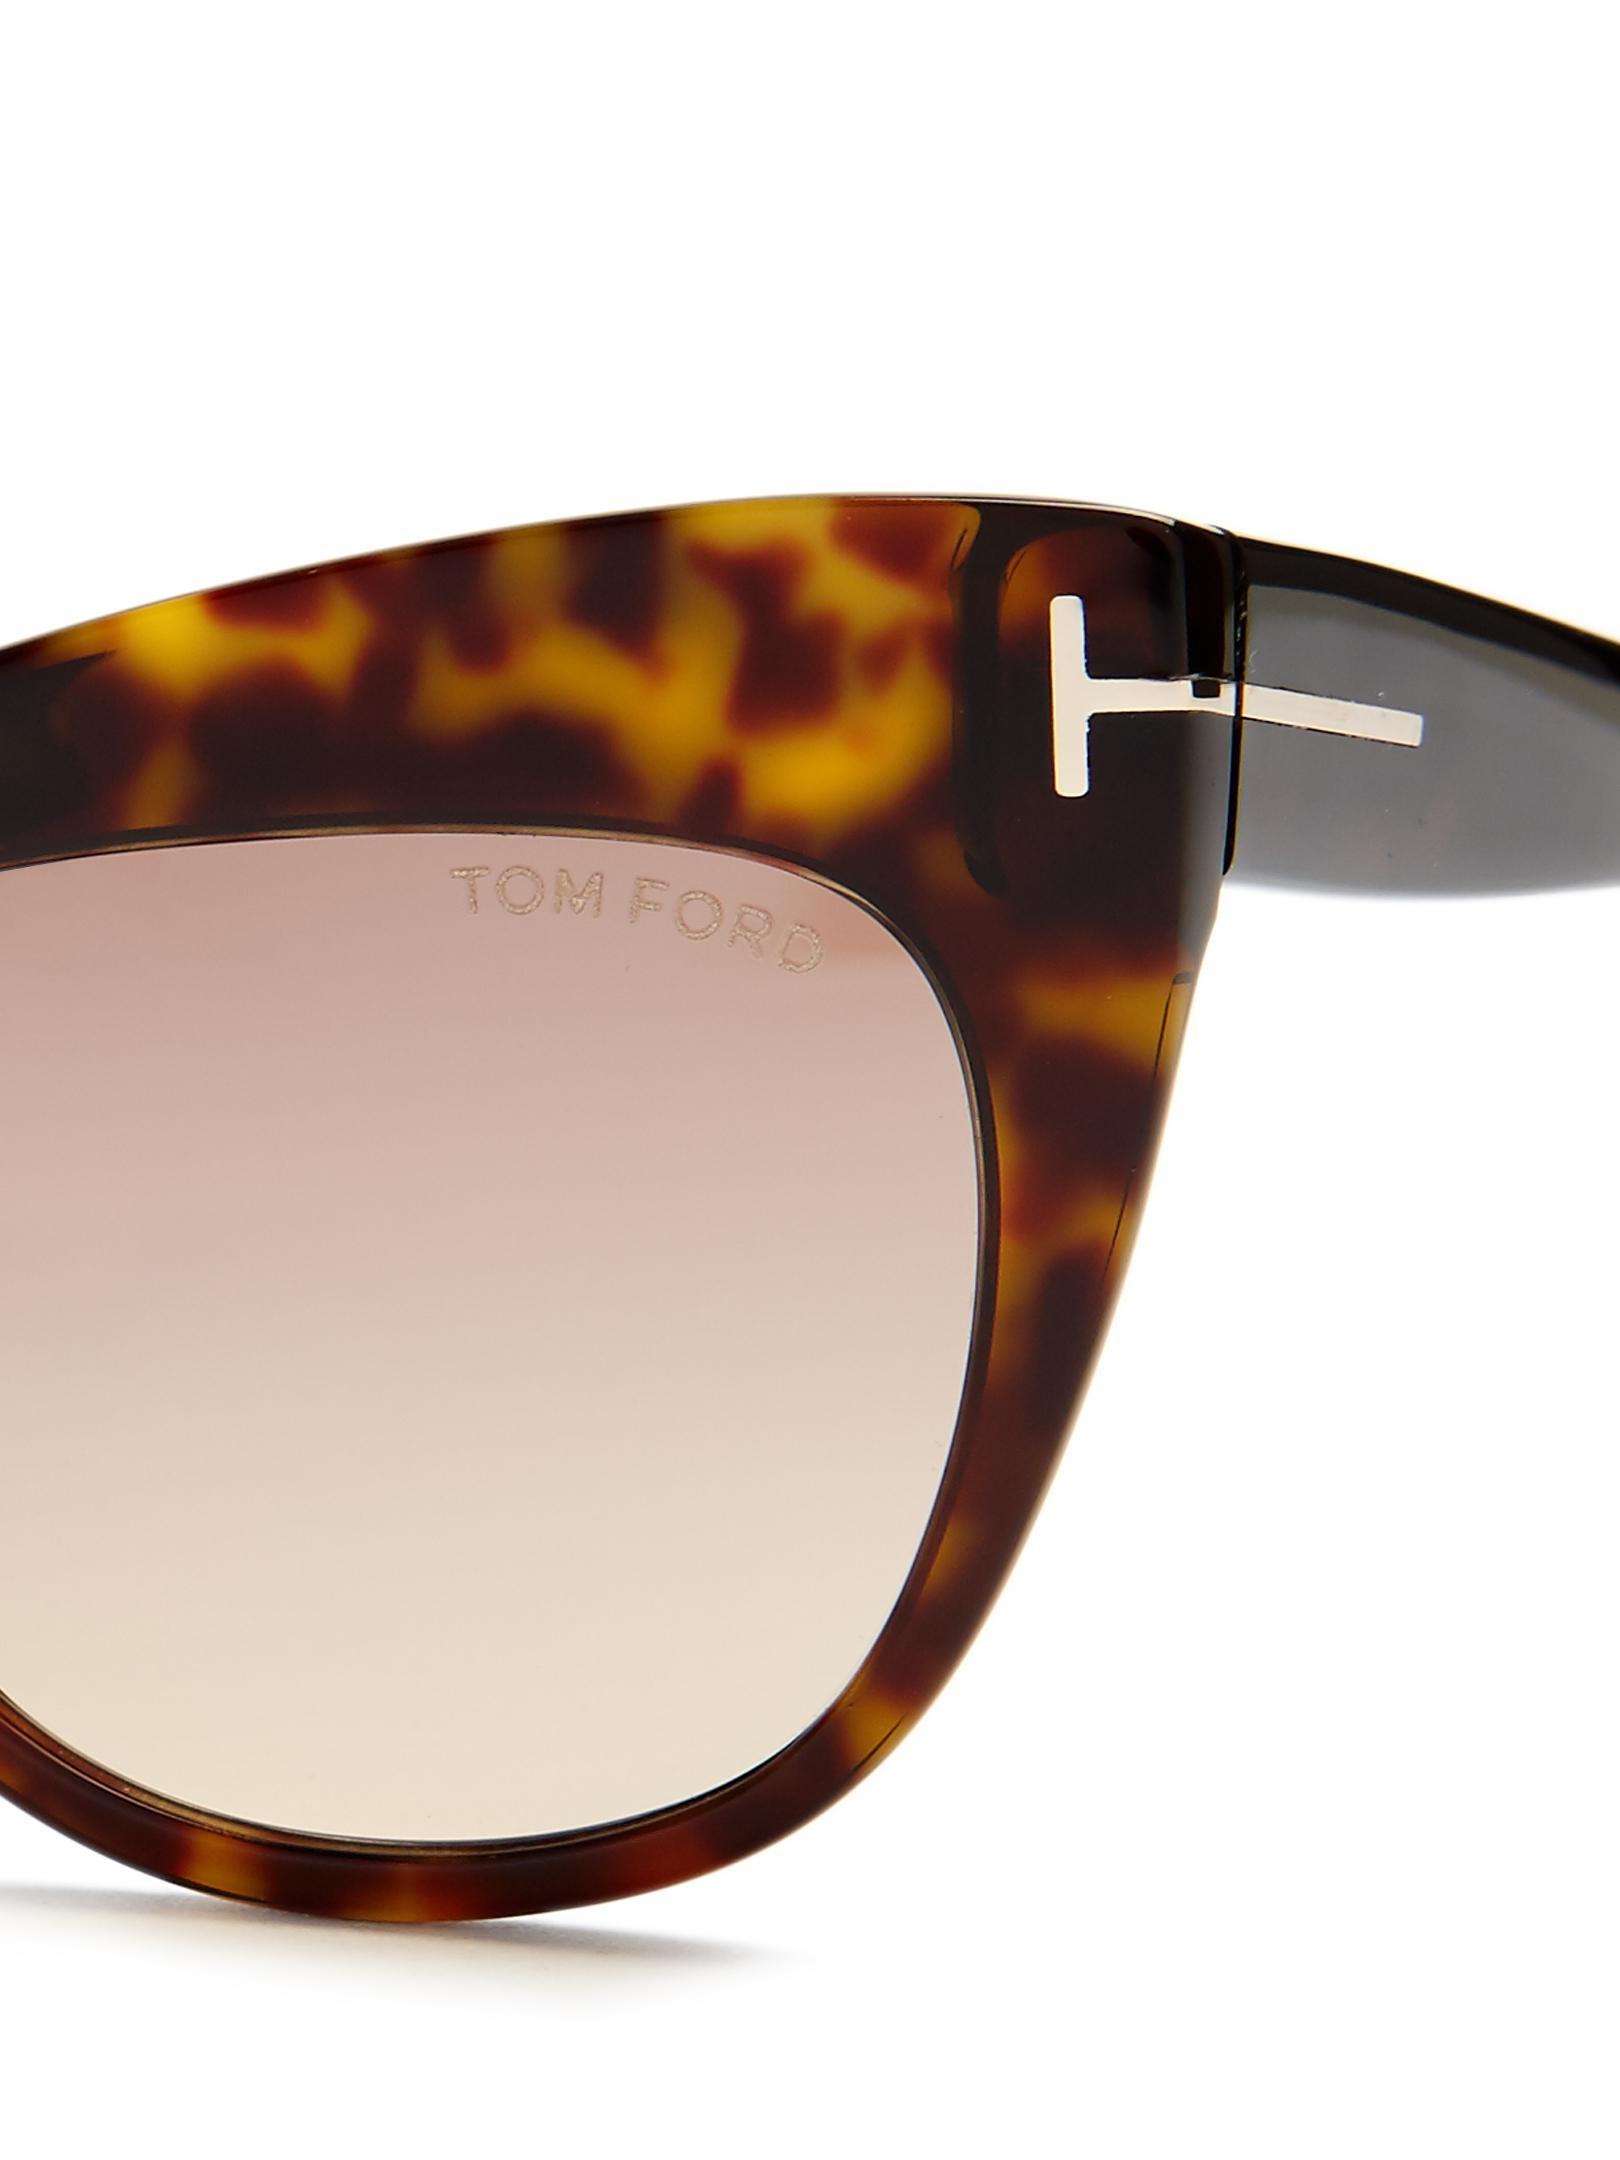 Lyst - Tom Ford Nika Cat-eye Sunglasses in Brown